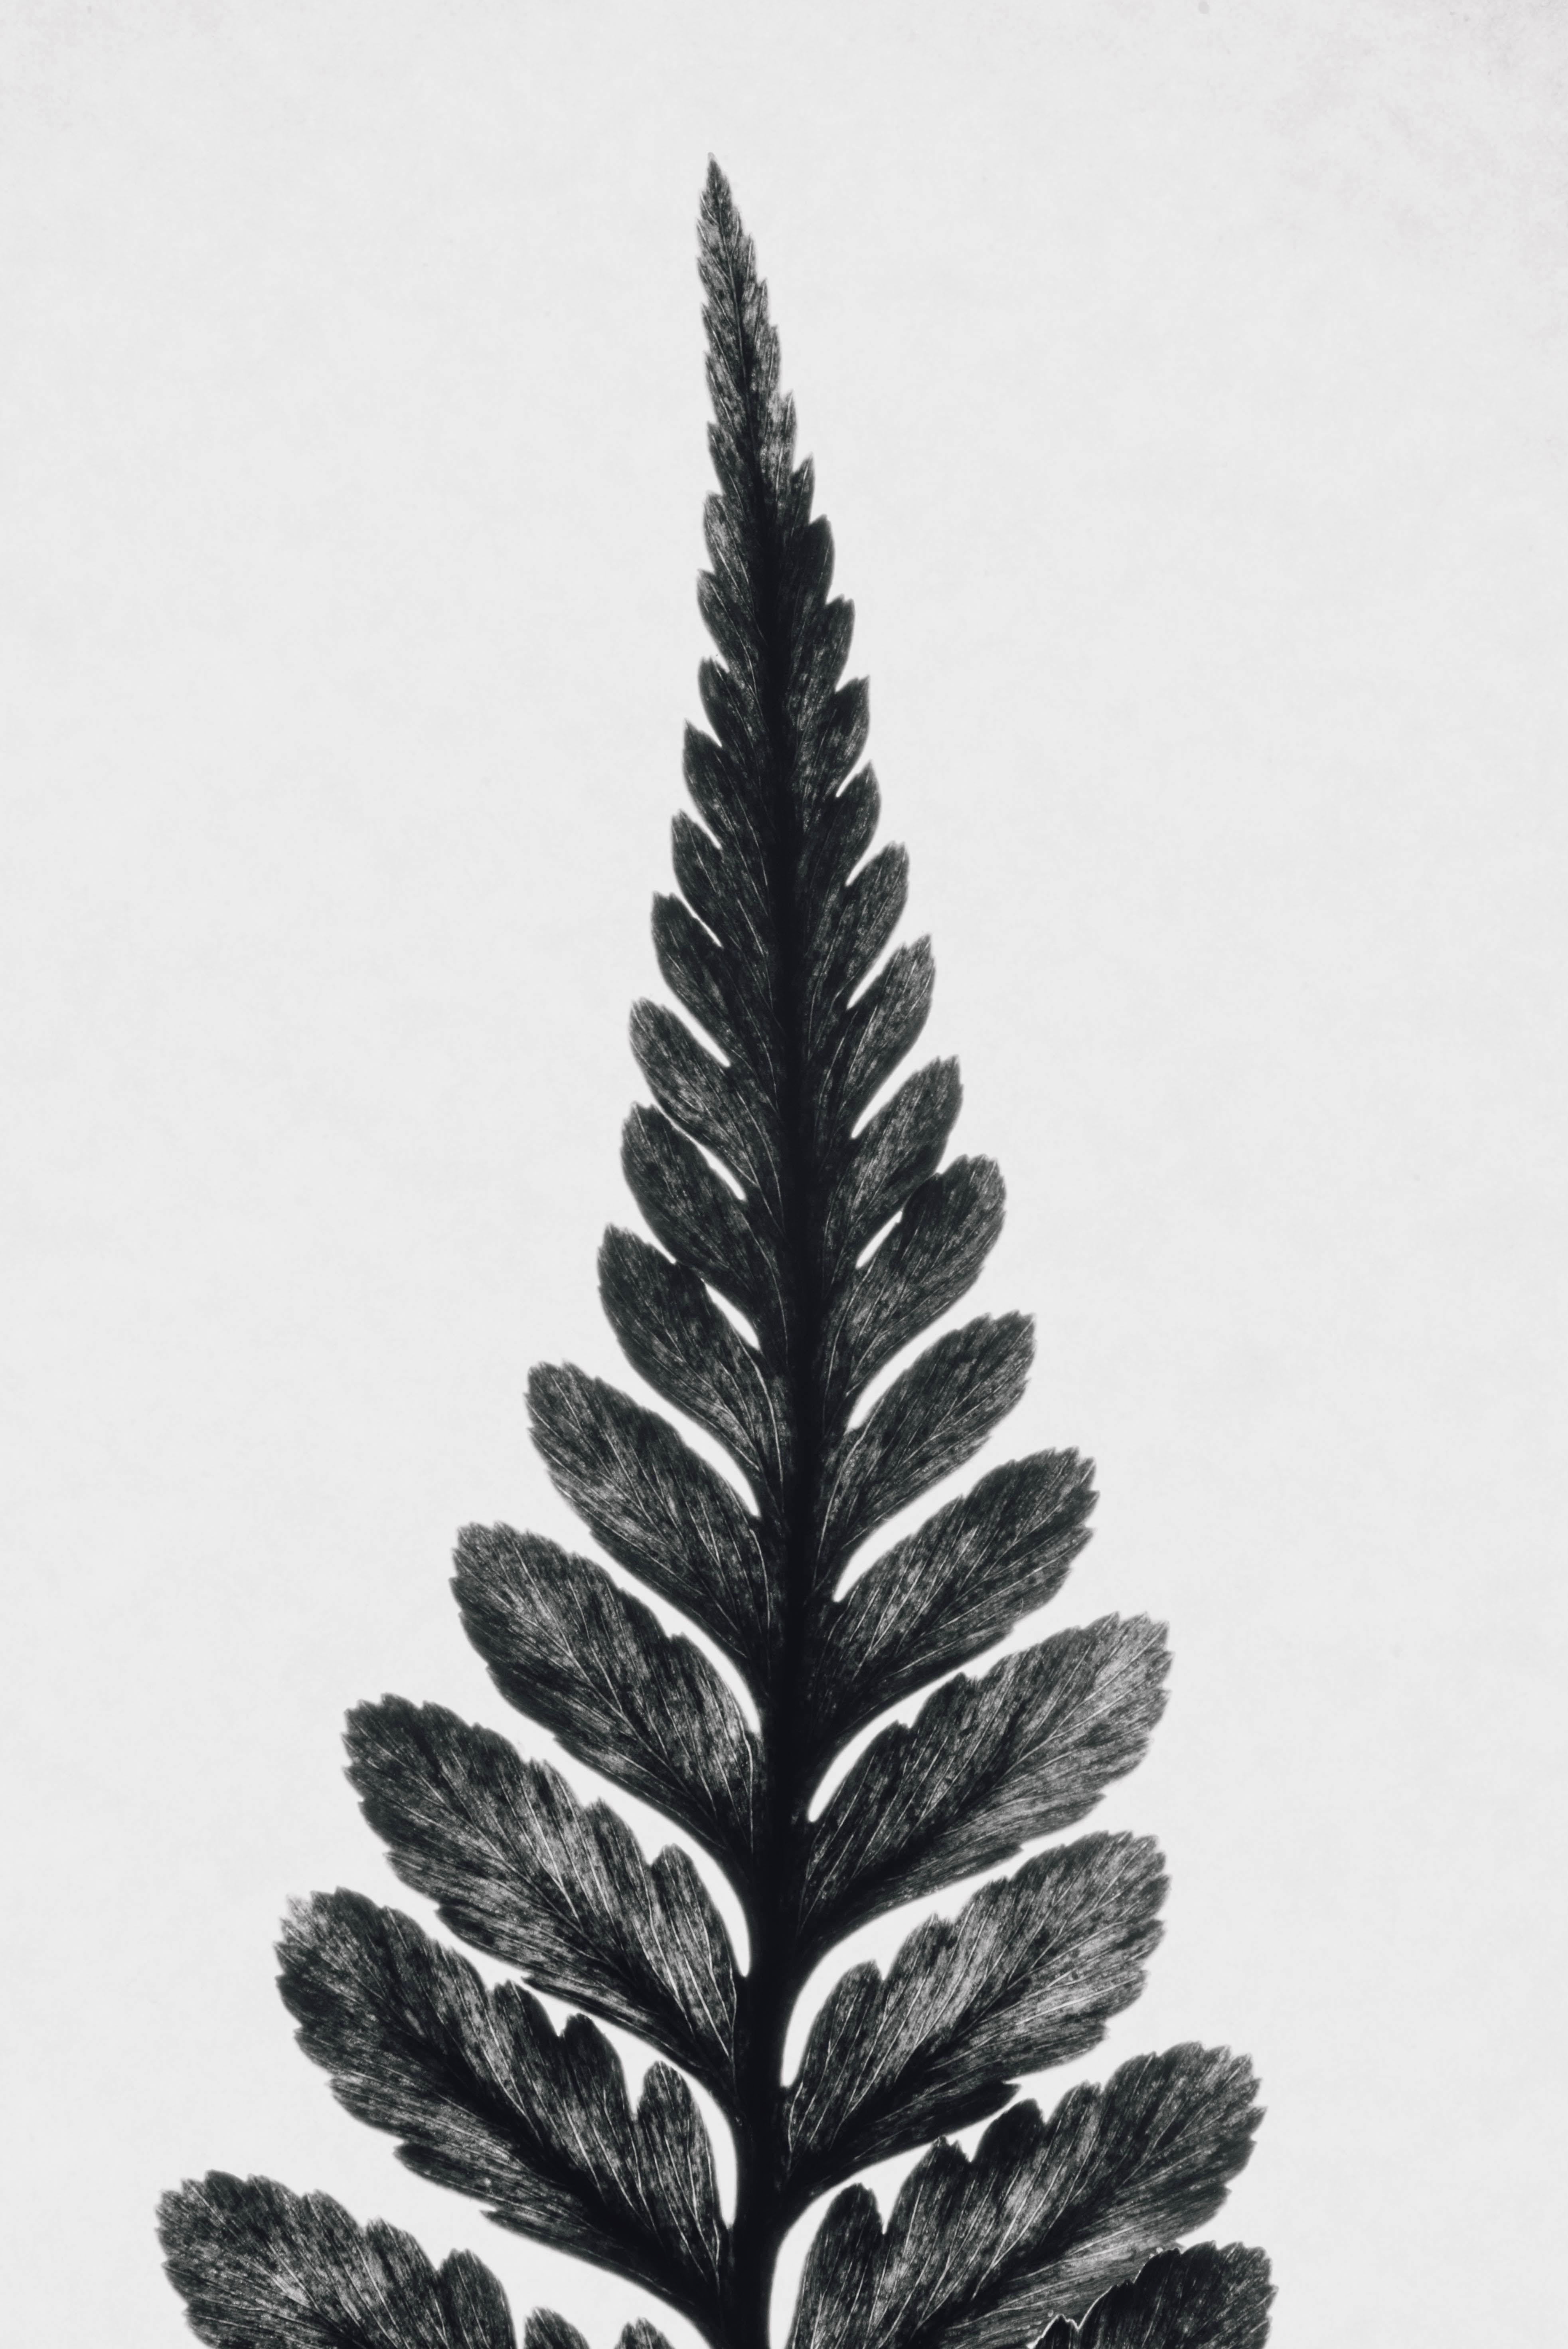 A tall leaf.